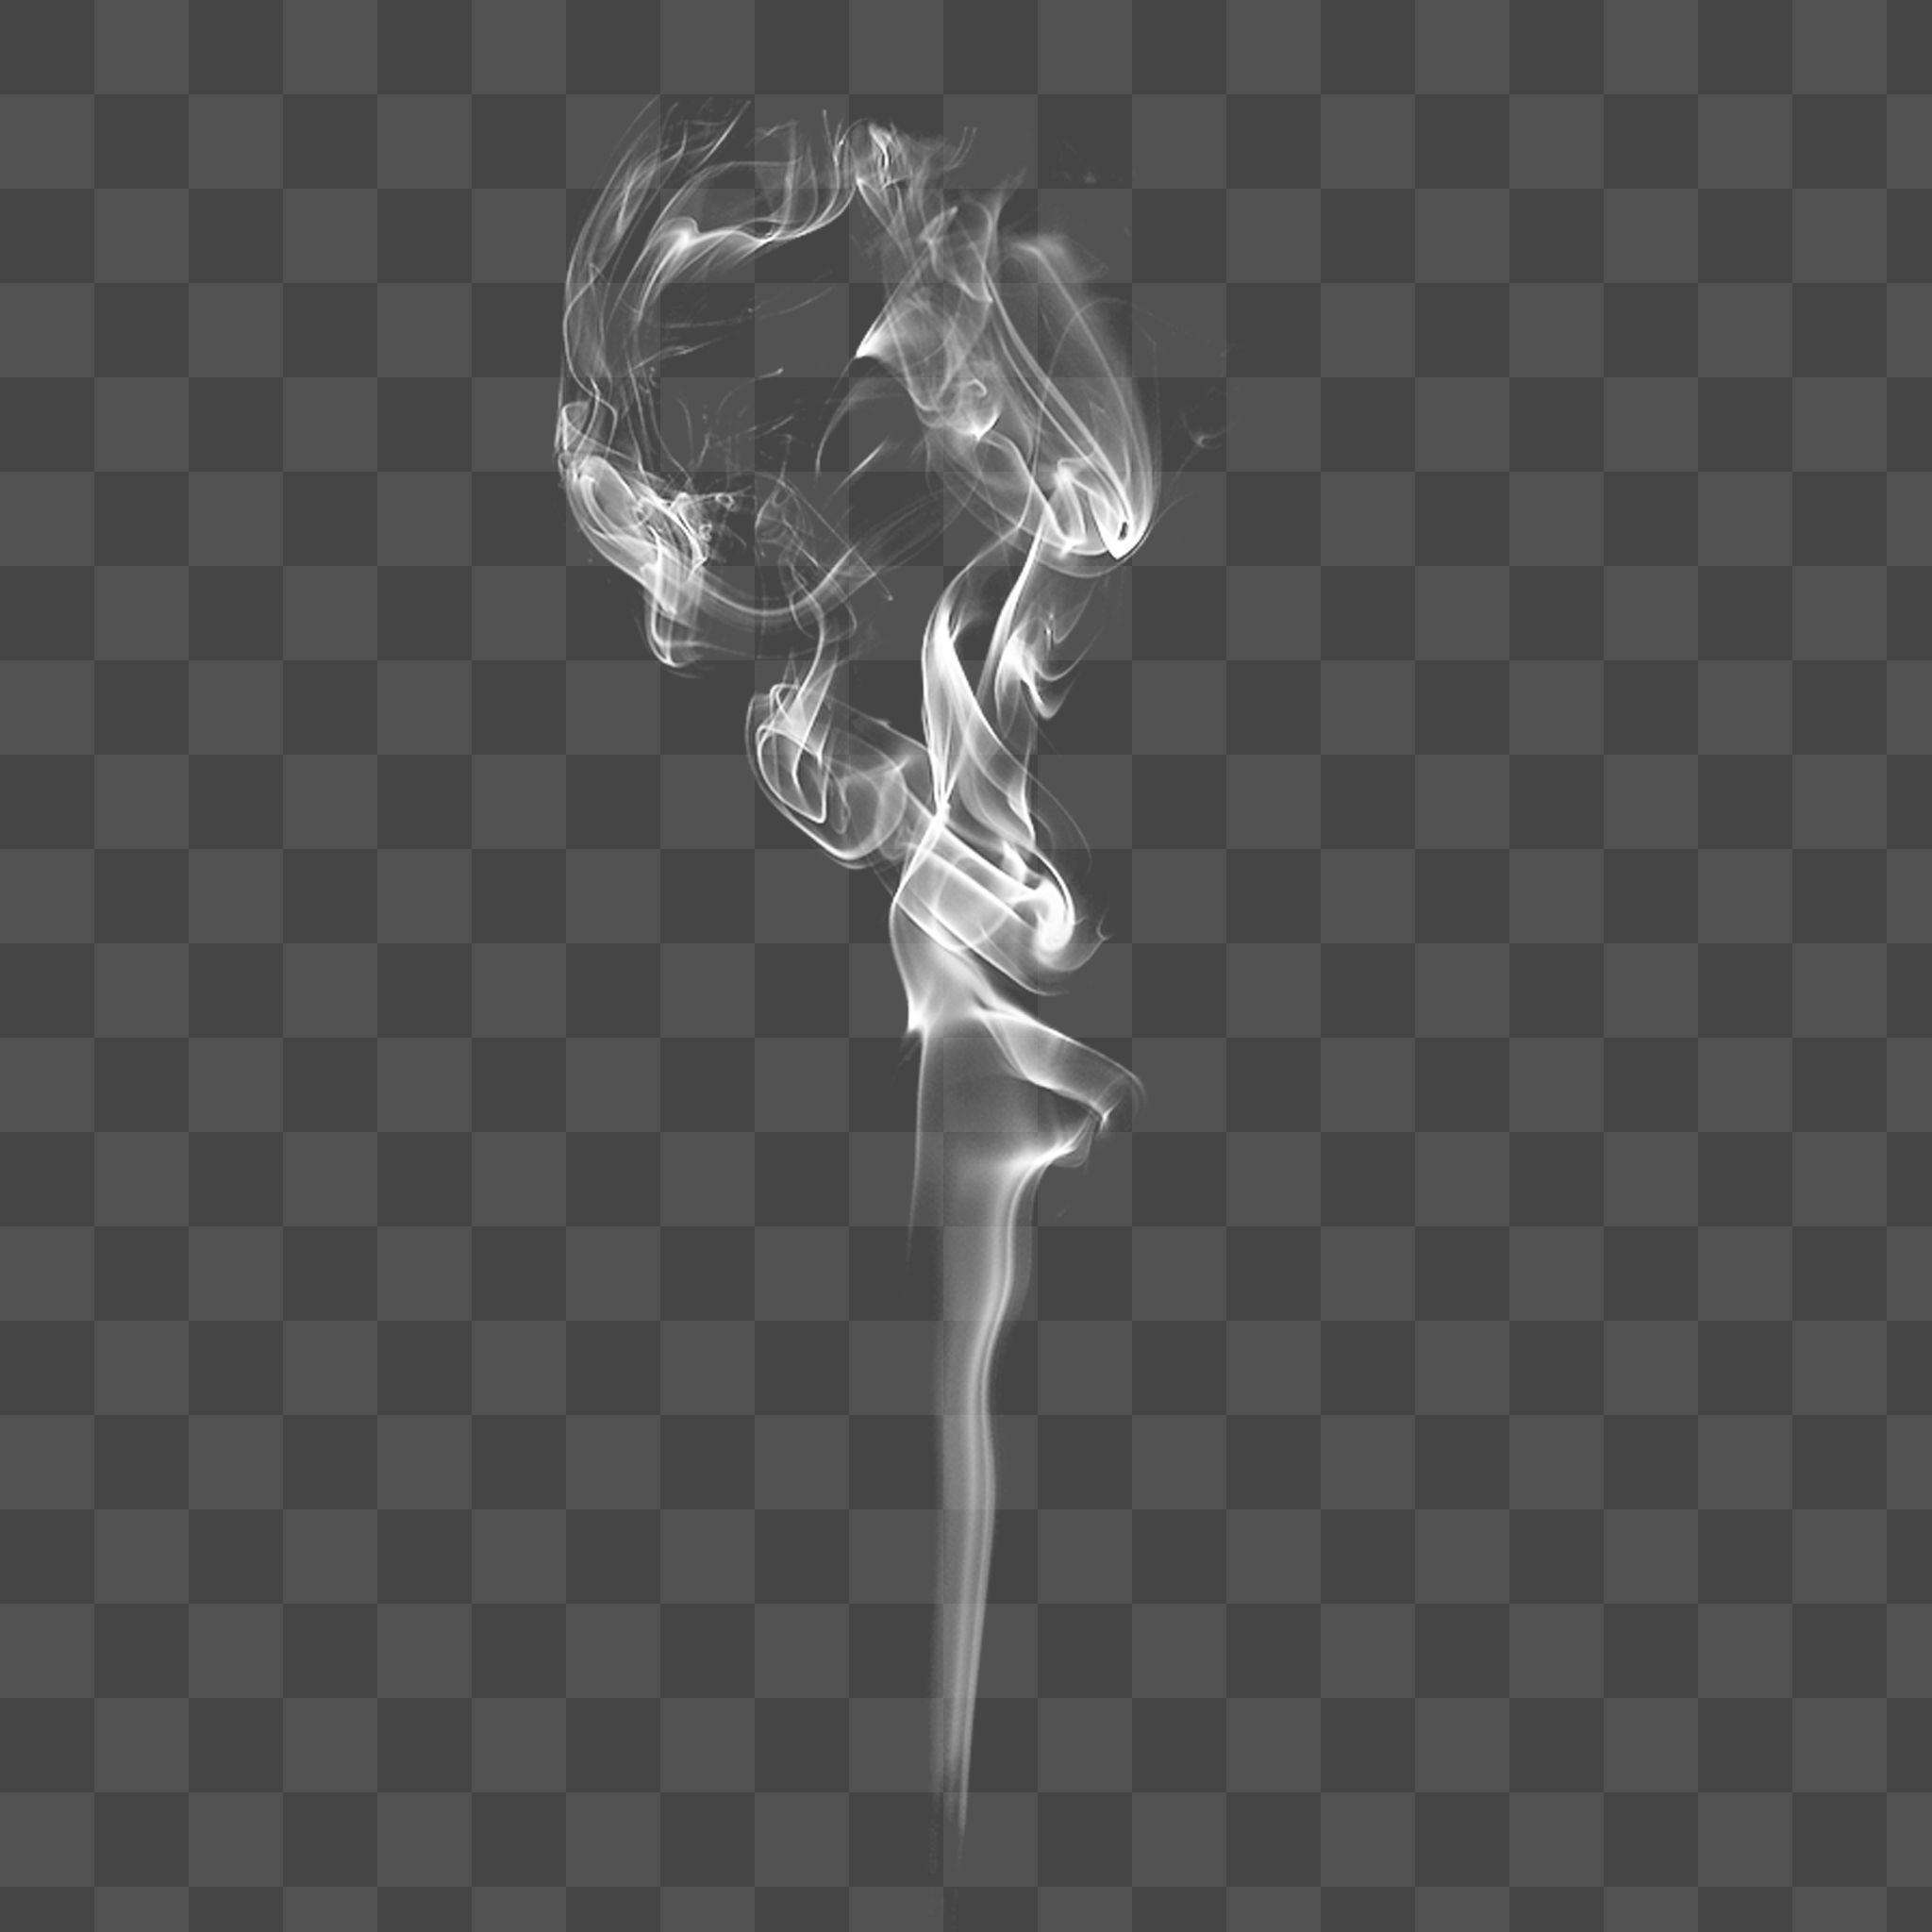 Smoke Png Image Free Download Smoke Texture Black Background Images Png Images